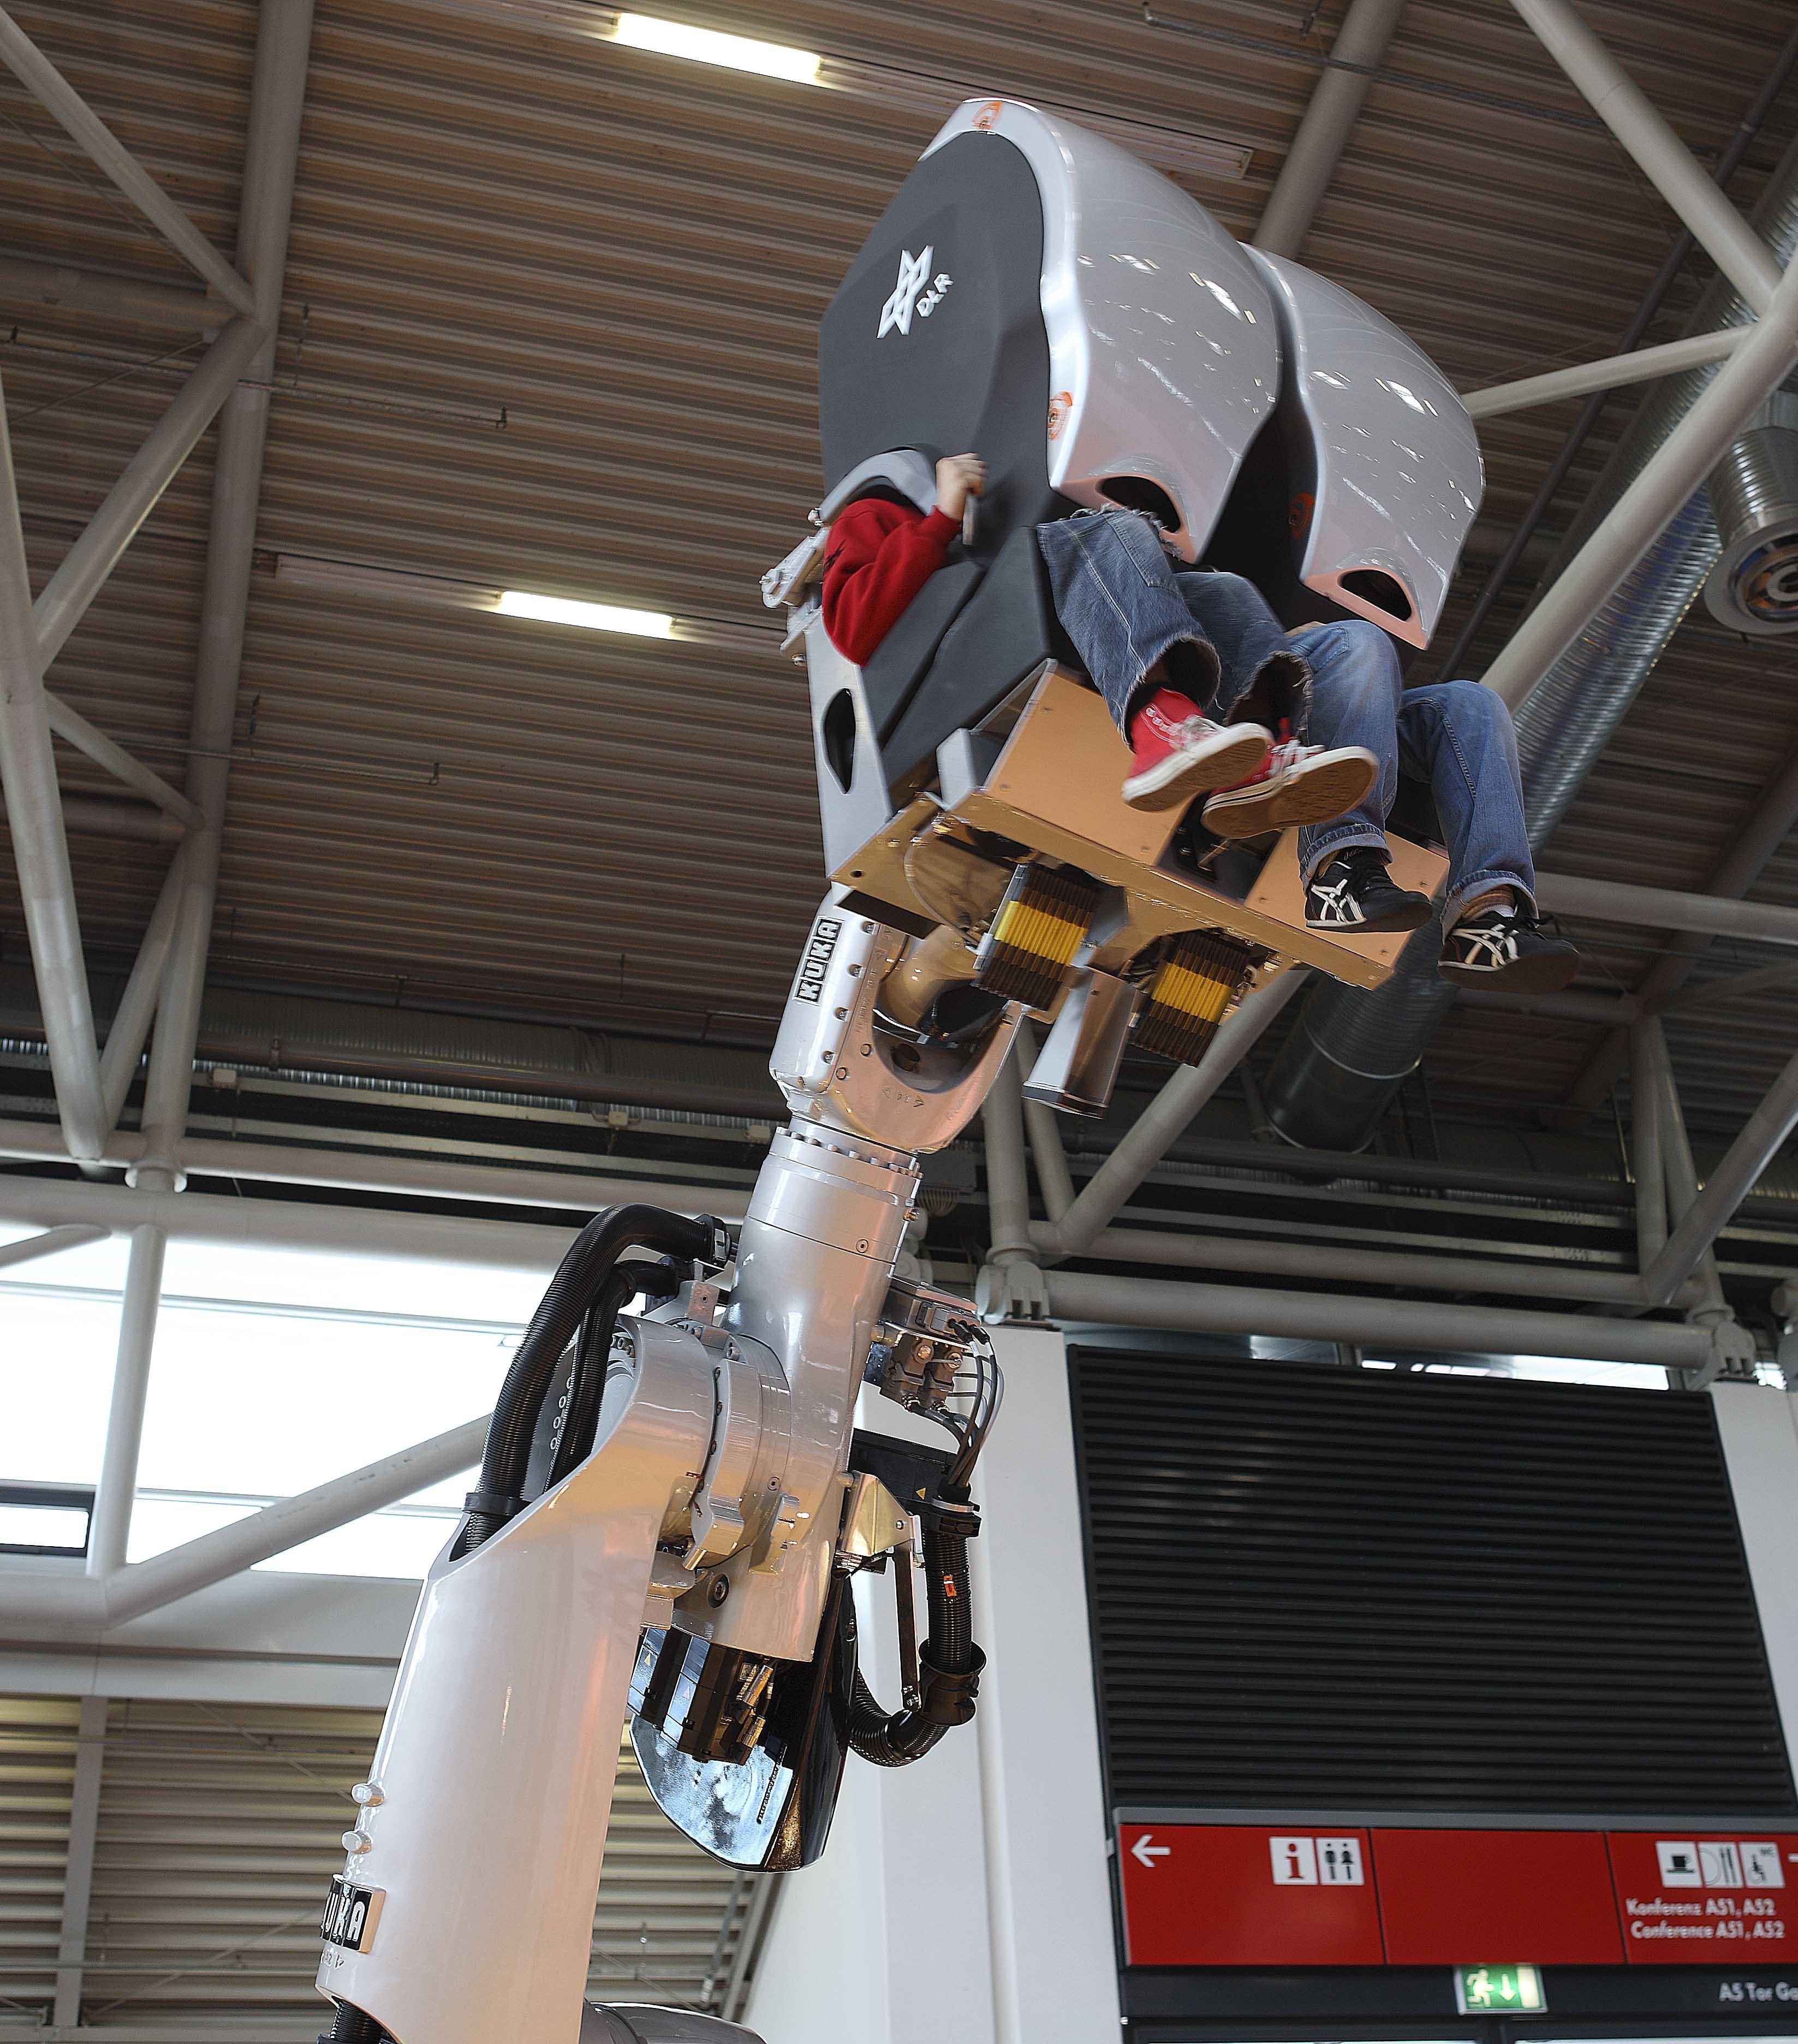 hydraulic racing simulator chair chicco high chairs replacement covers kuka robotics 39 robosim 4 d